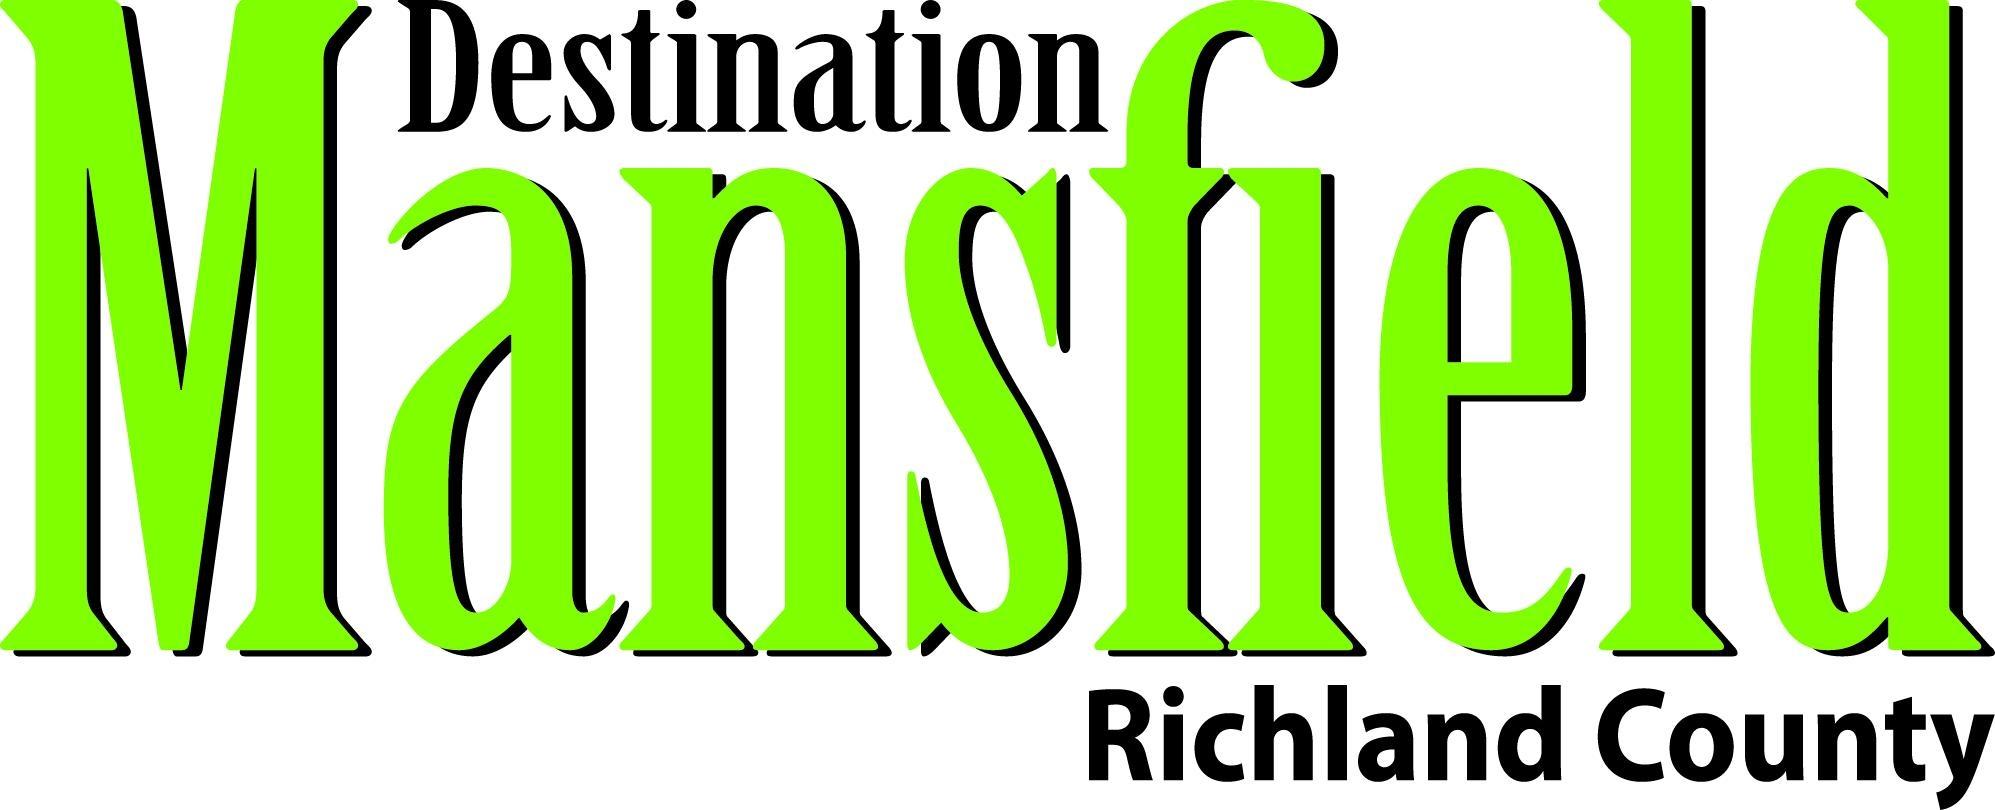 DestinationMansfield logo color.jpg